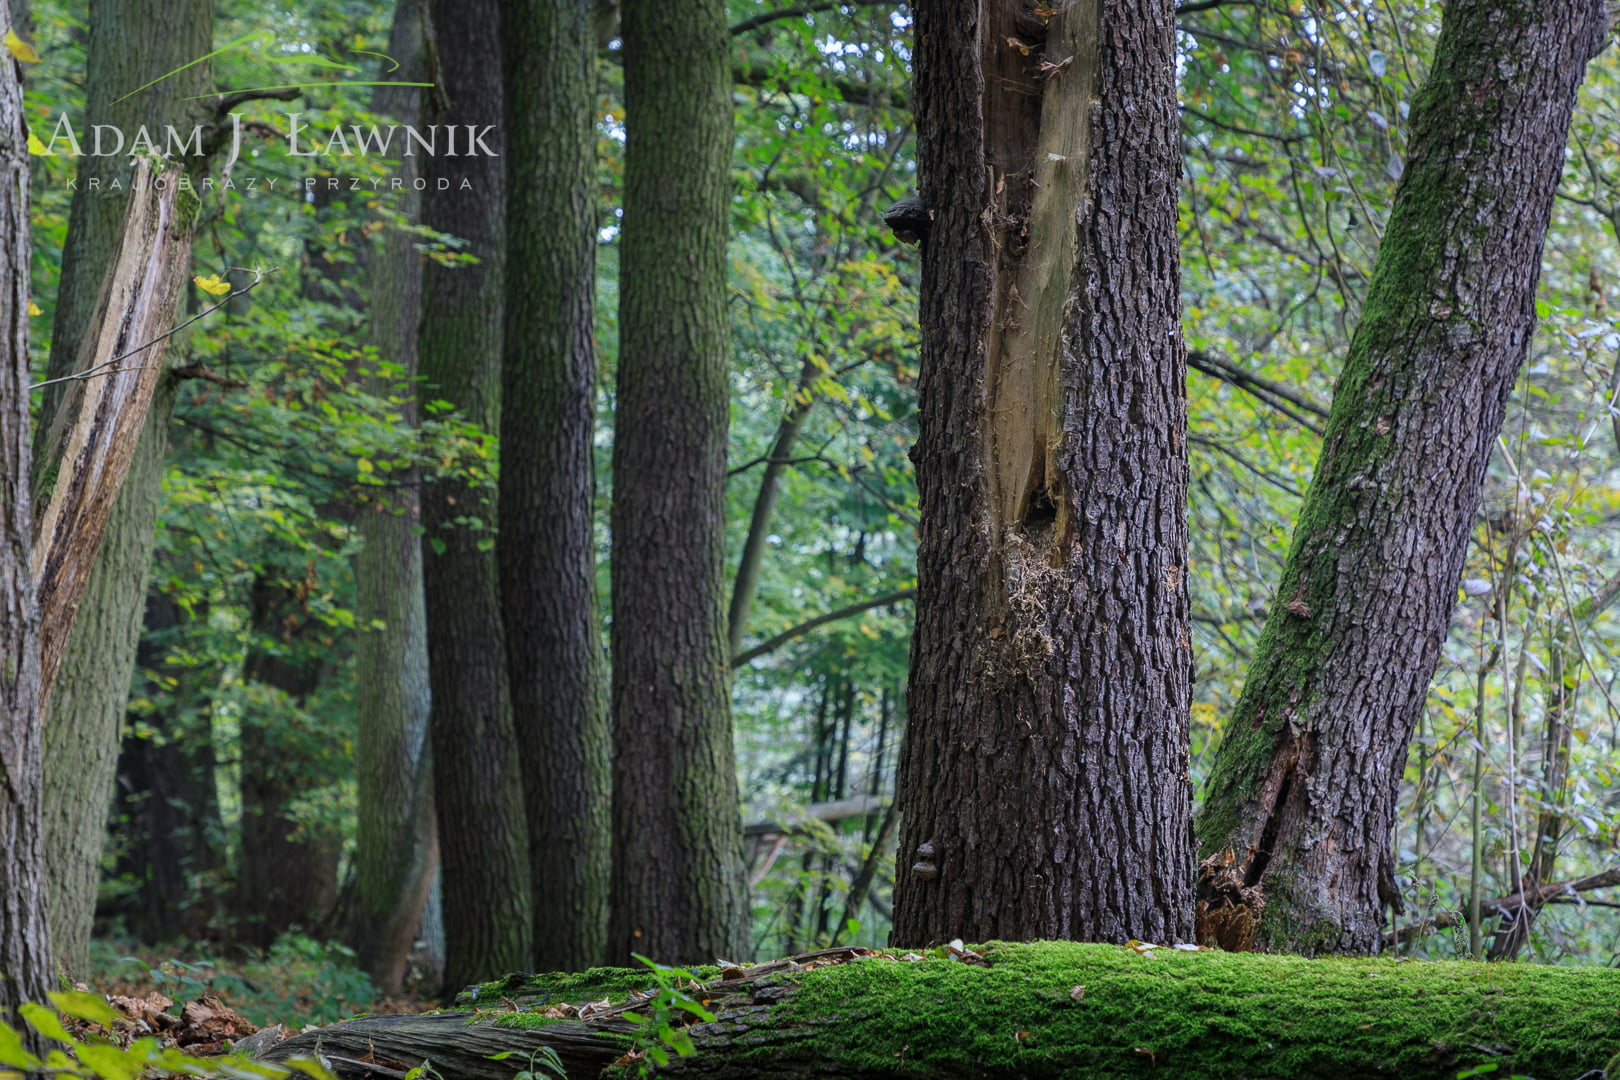 Kampinos National Park, Poland 1810-00456C